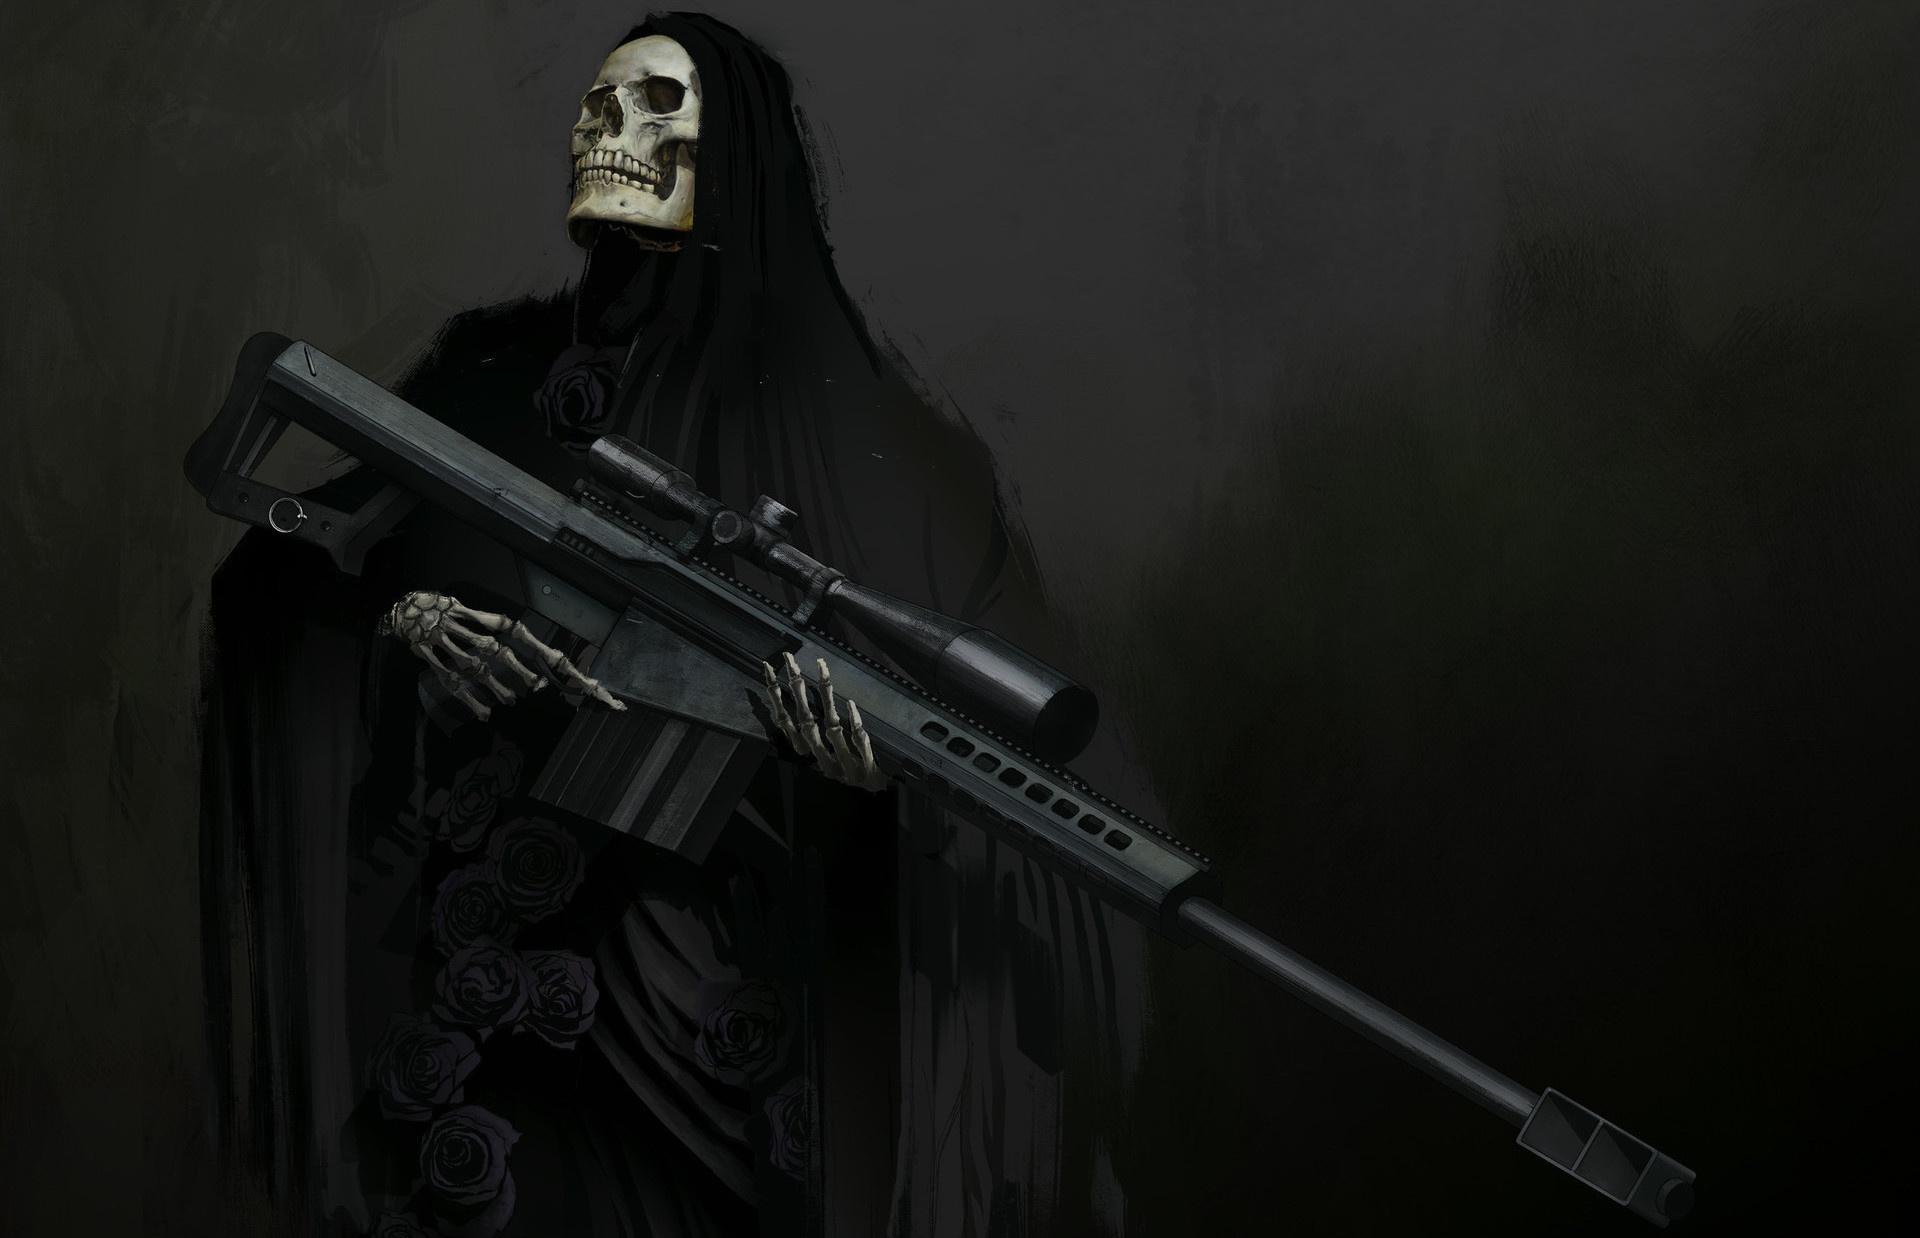 Grim Reaper, sniper rifle 1920x1238